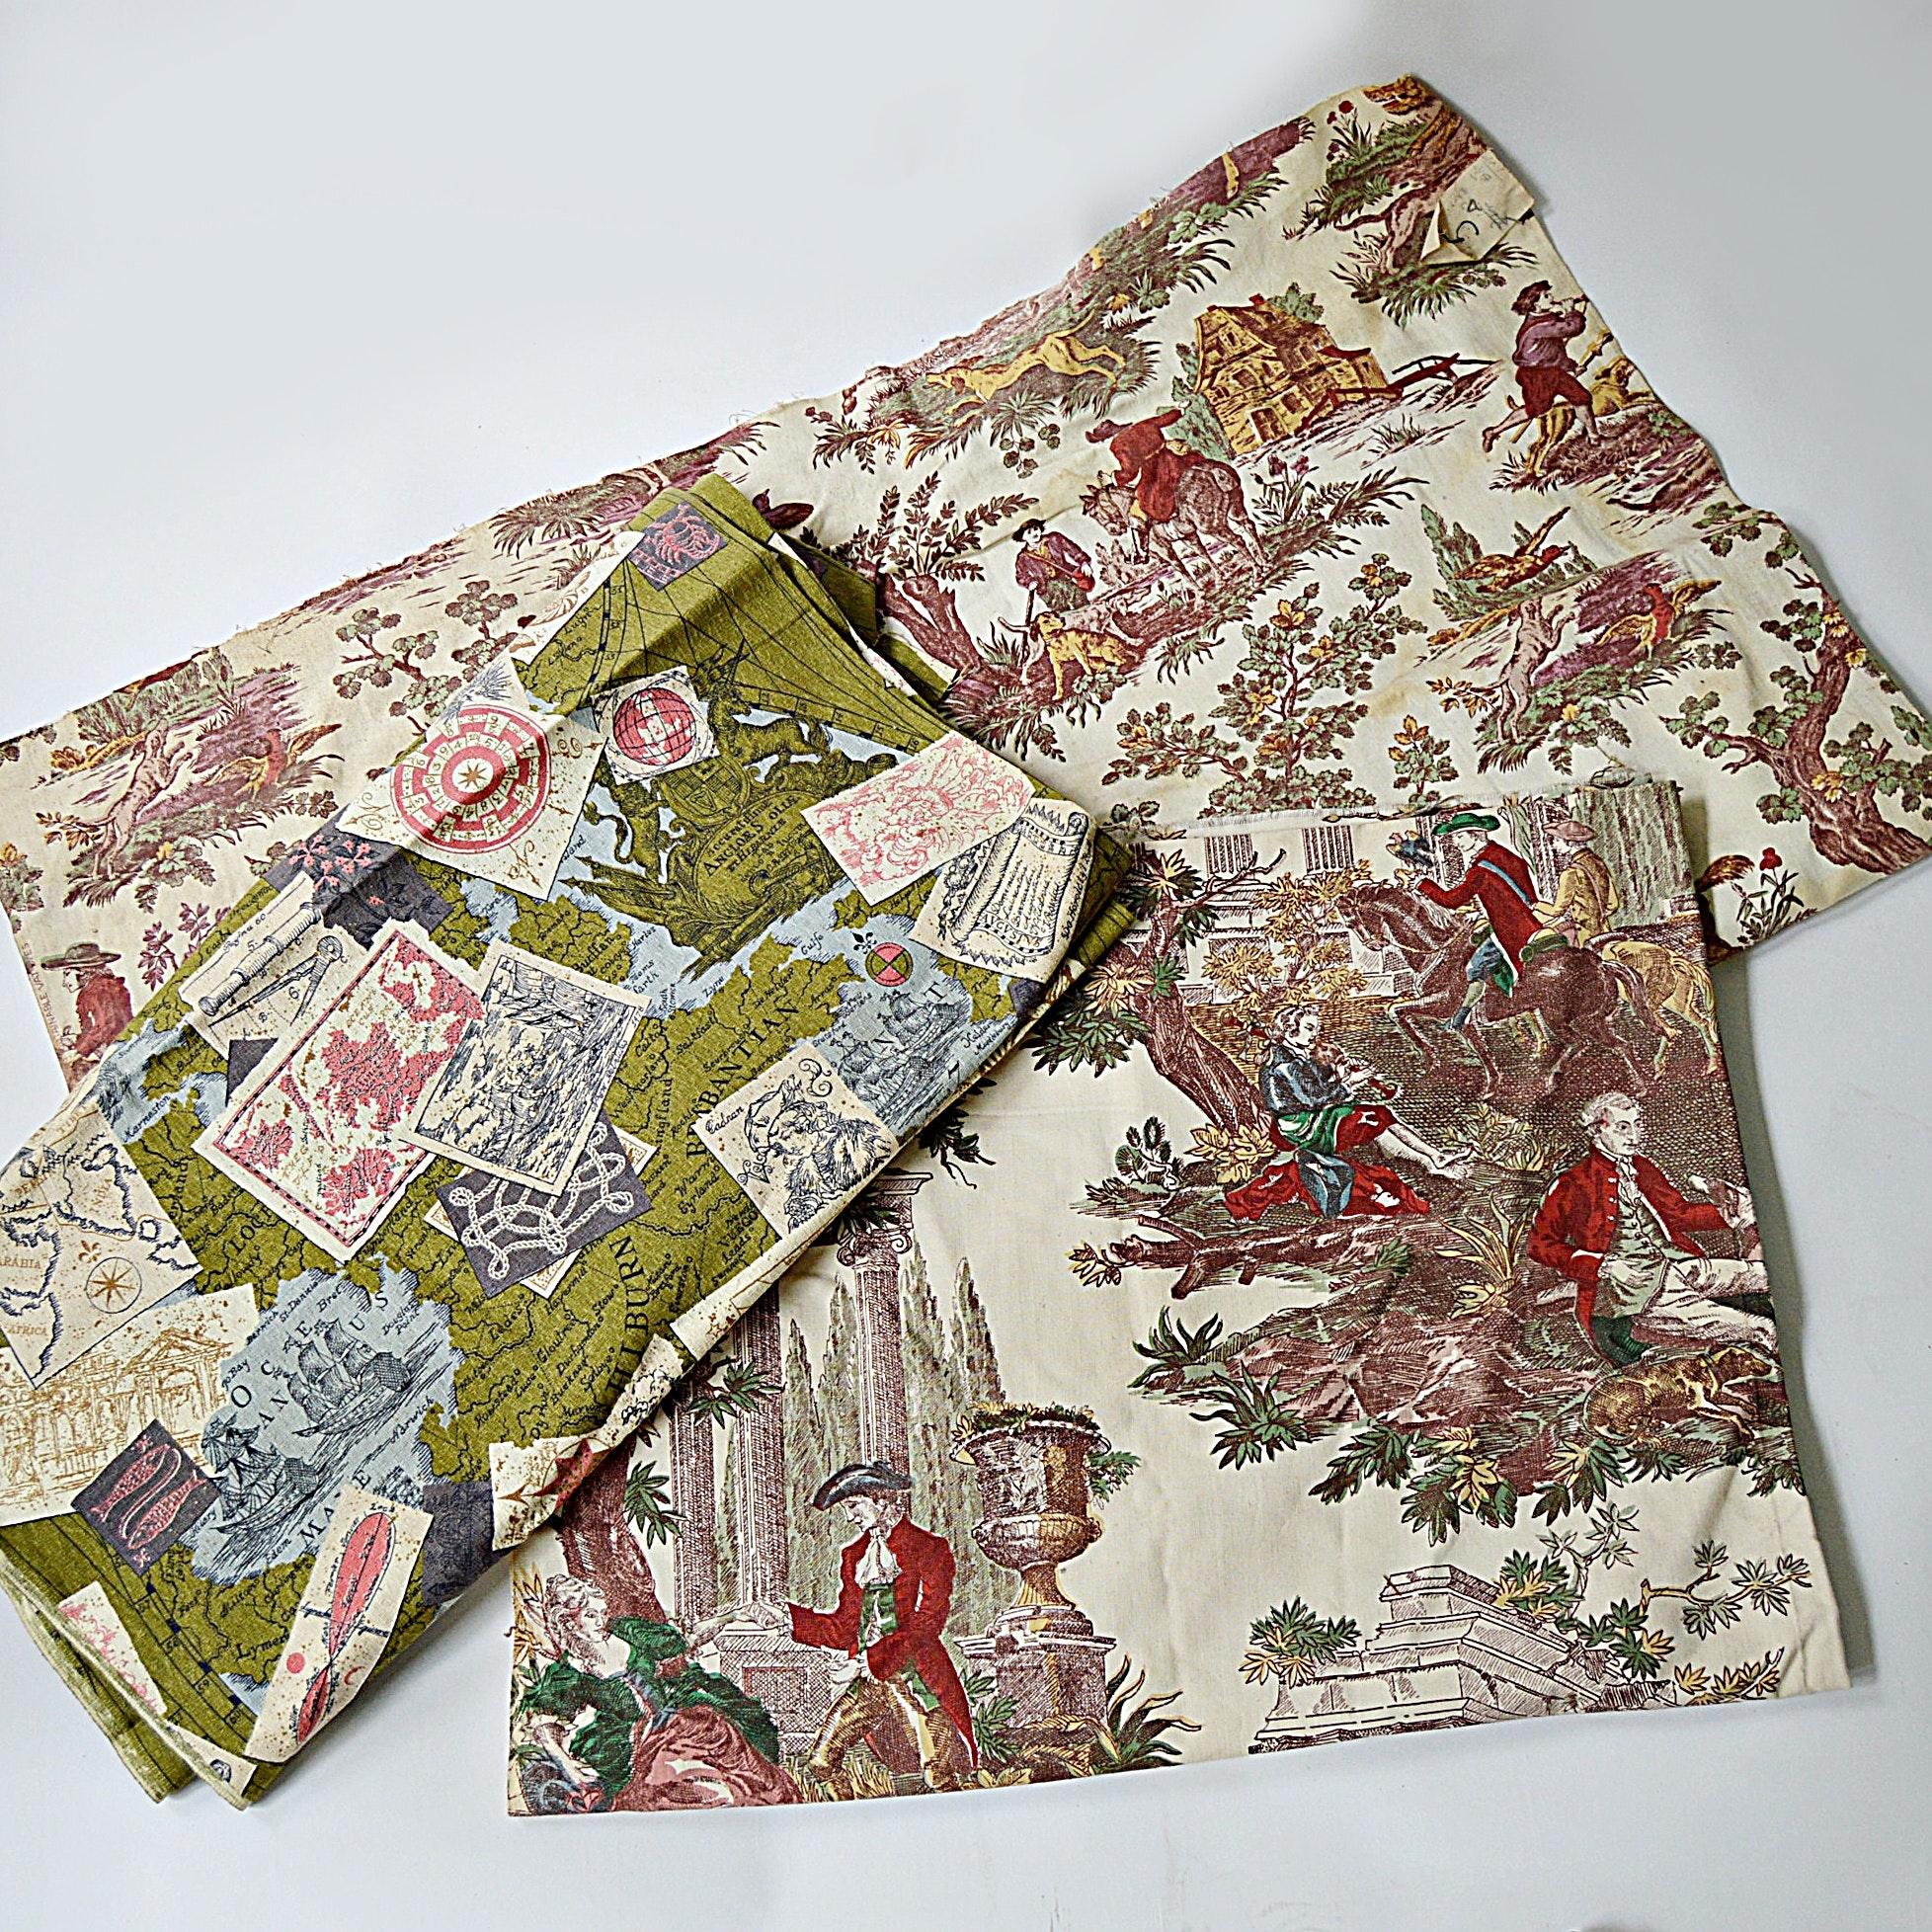 Vintage Patterned Cotton Fabrics